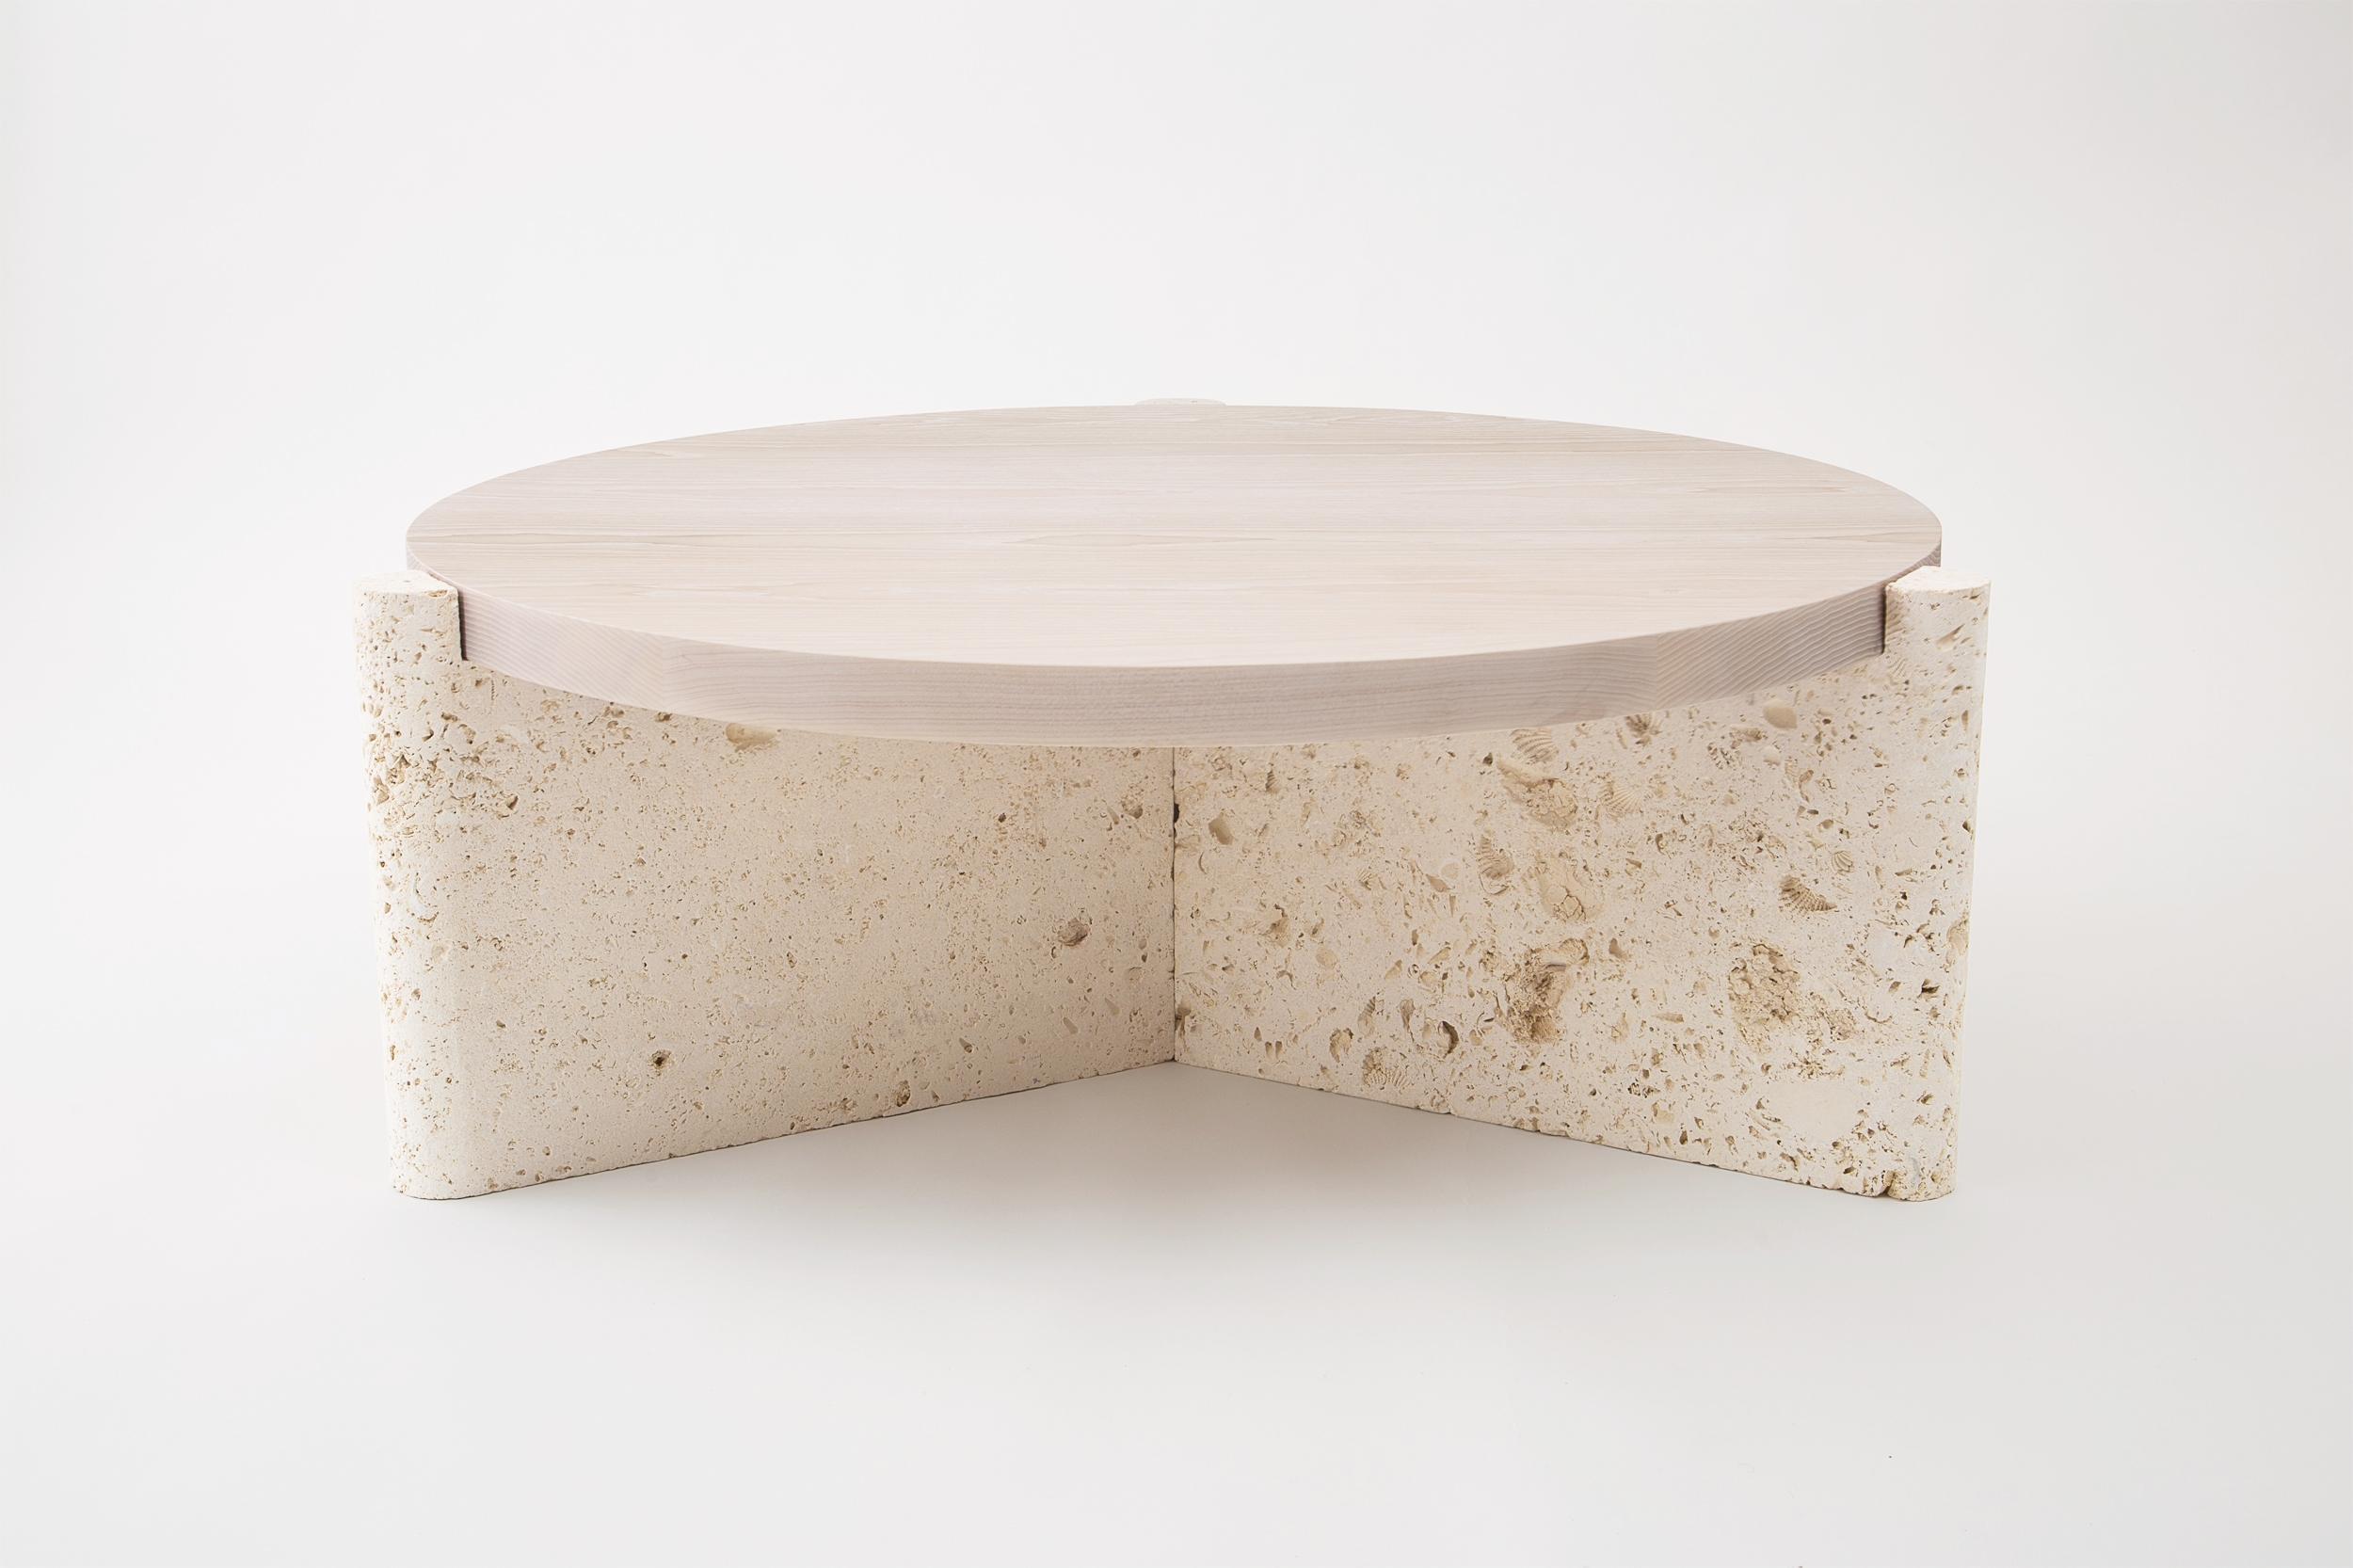 YUCCASTUFF_CONCHO TABLE_VIEW 002.jpg